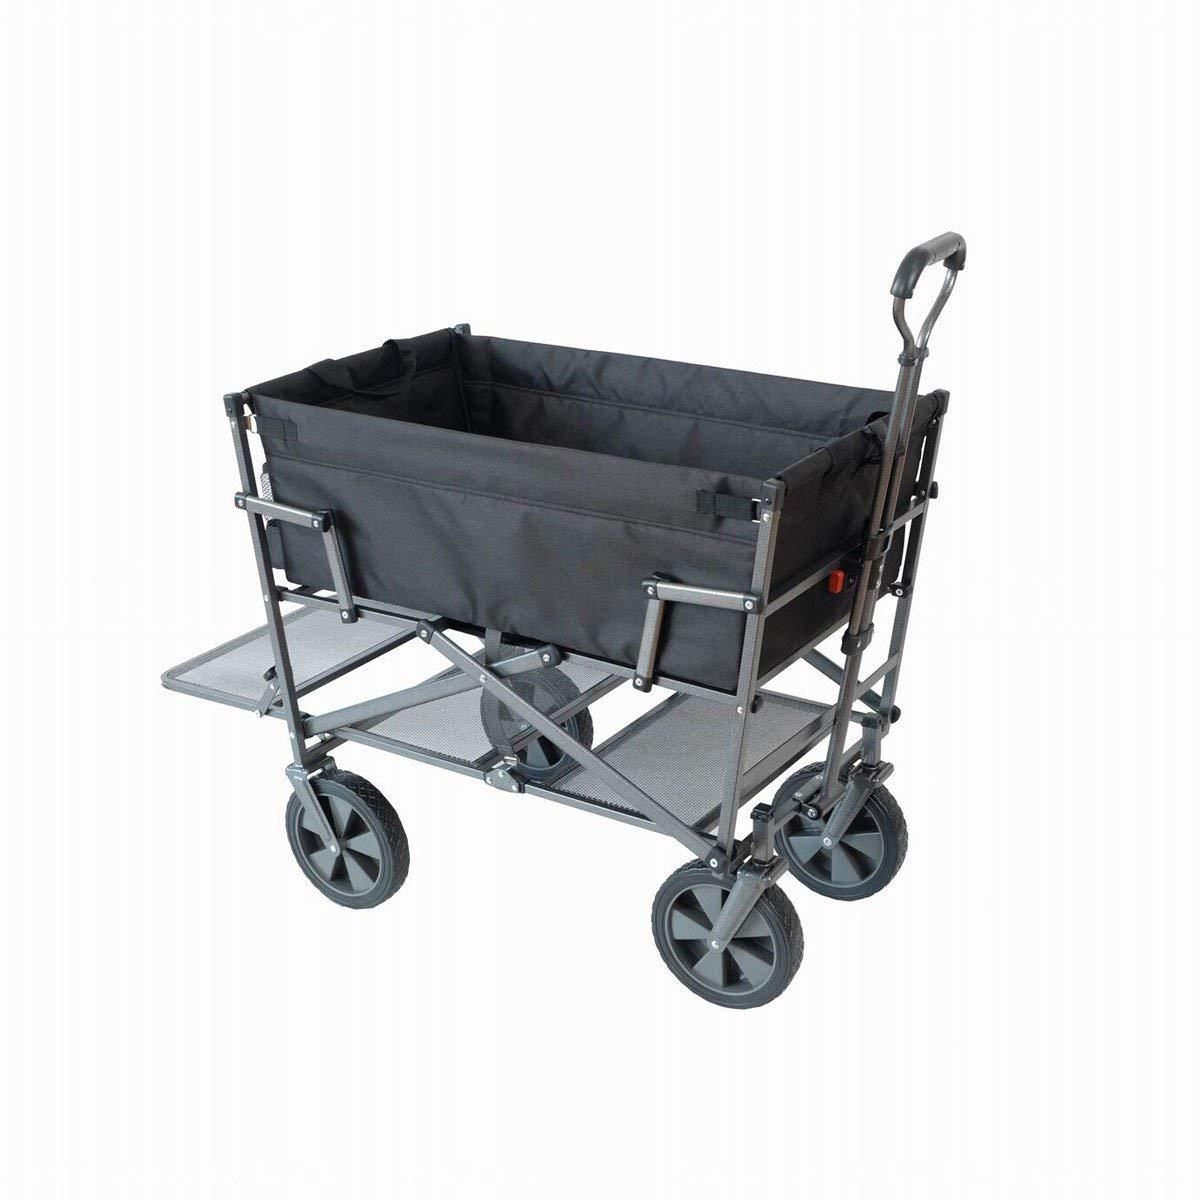 Mac Sports Heavy Duty Steel Double Decker Collapsible Yard Cart Wagon, Black (2 Pack)